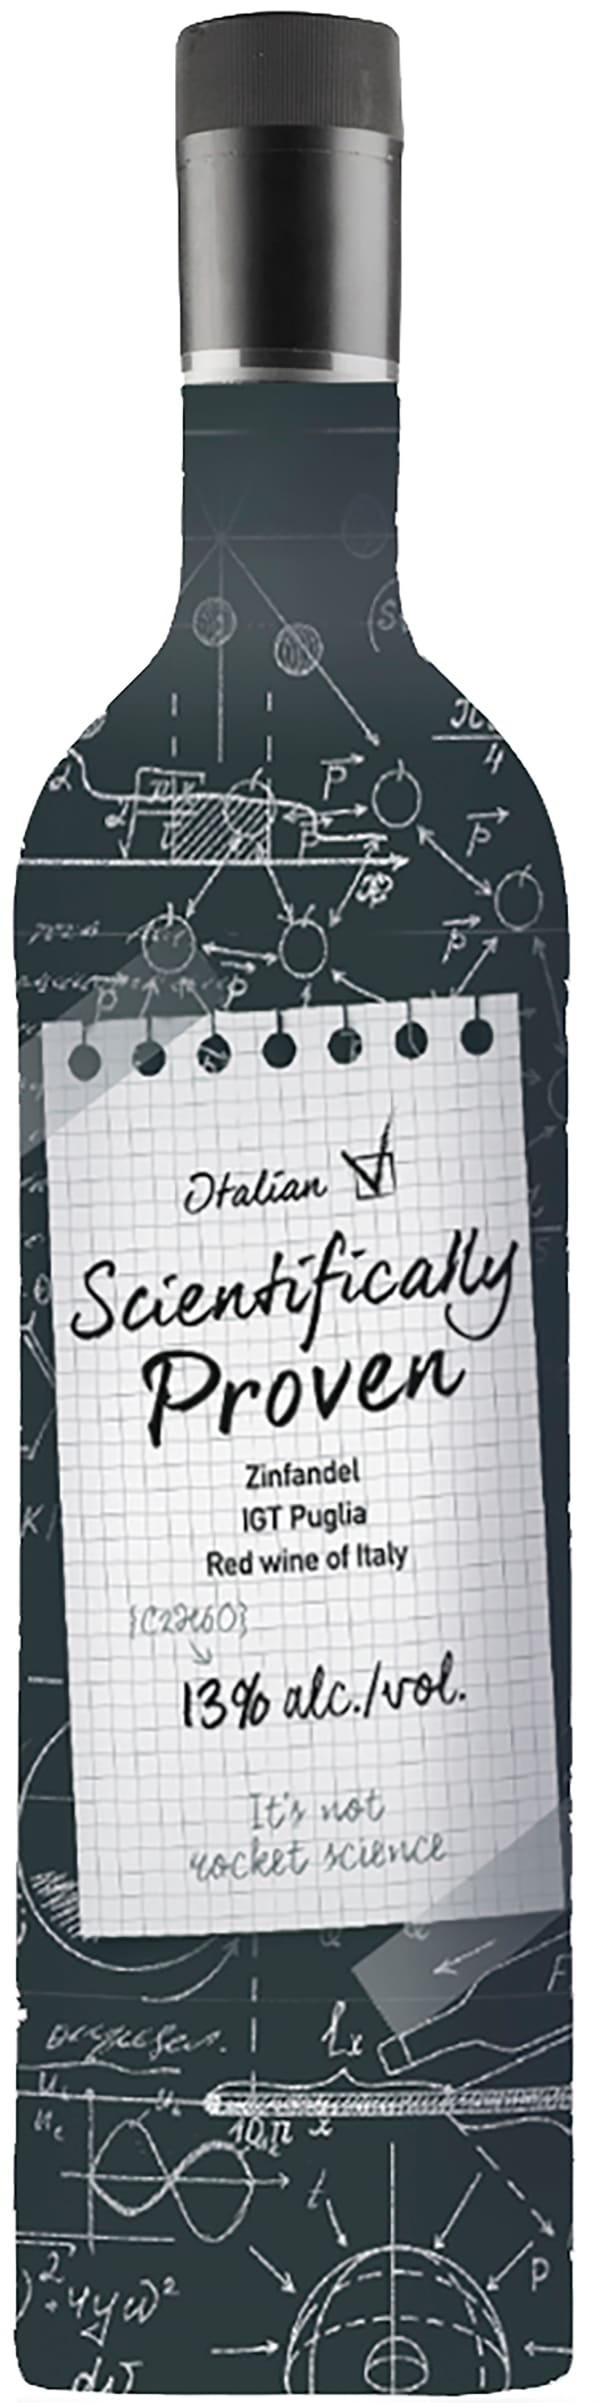 Scientifically Proven Italian Zinfandel plastflaska